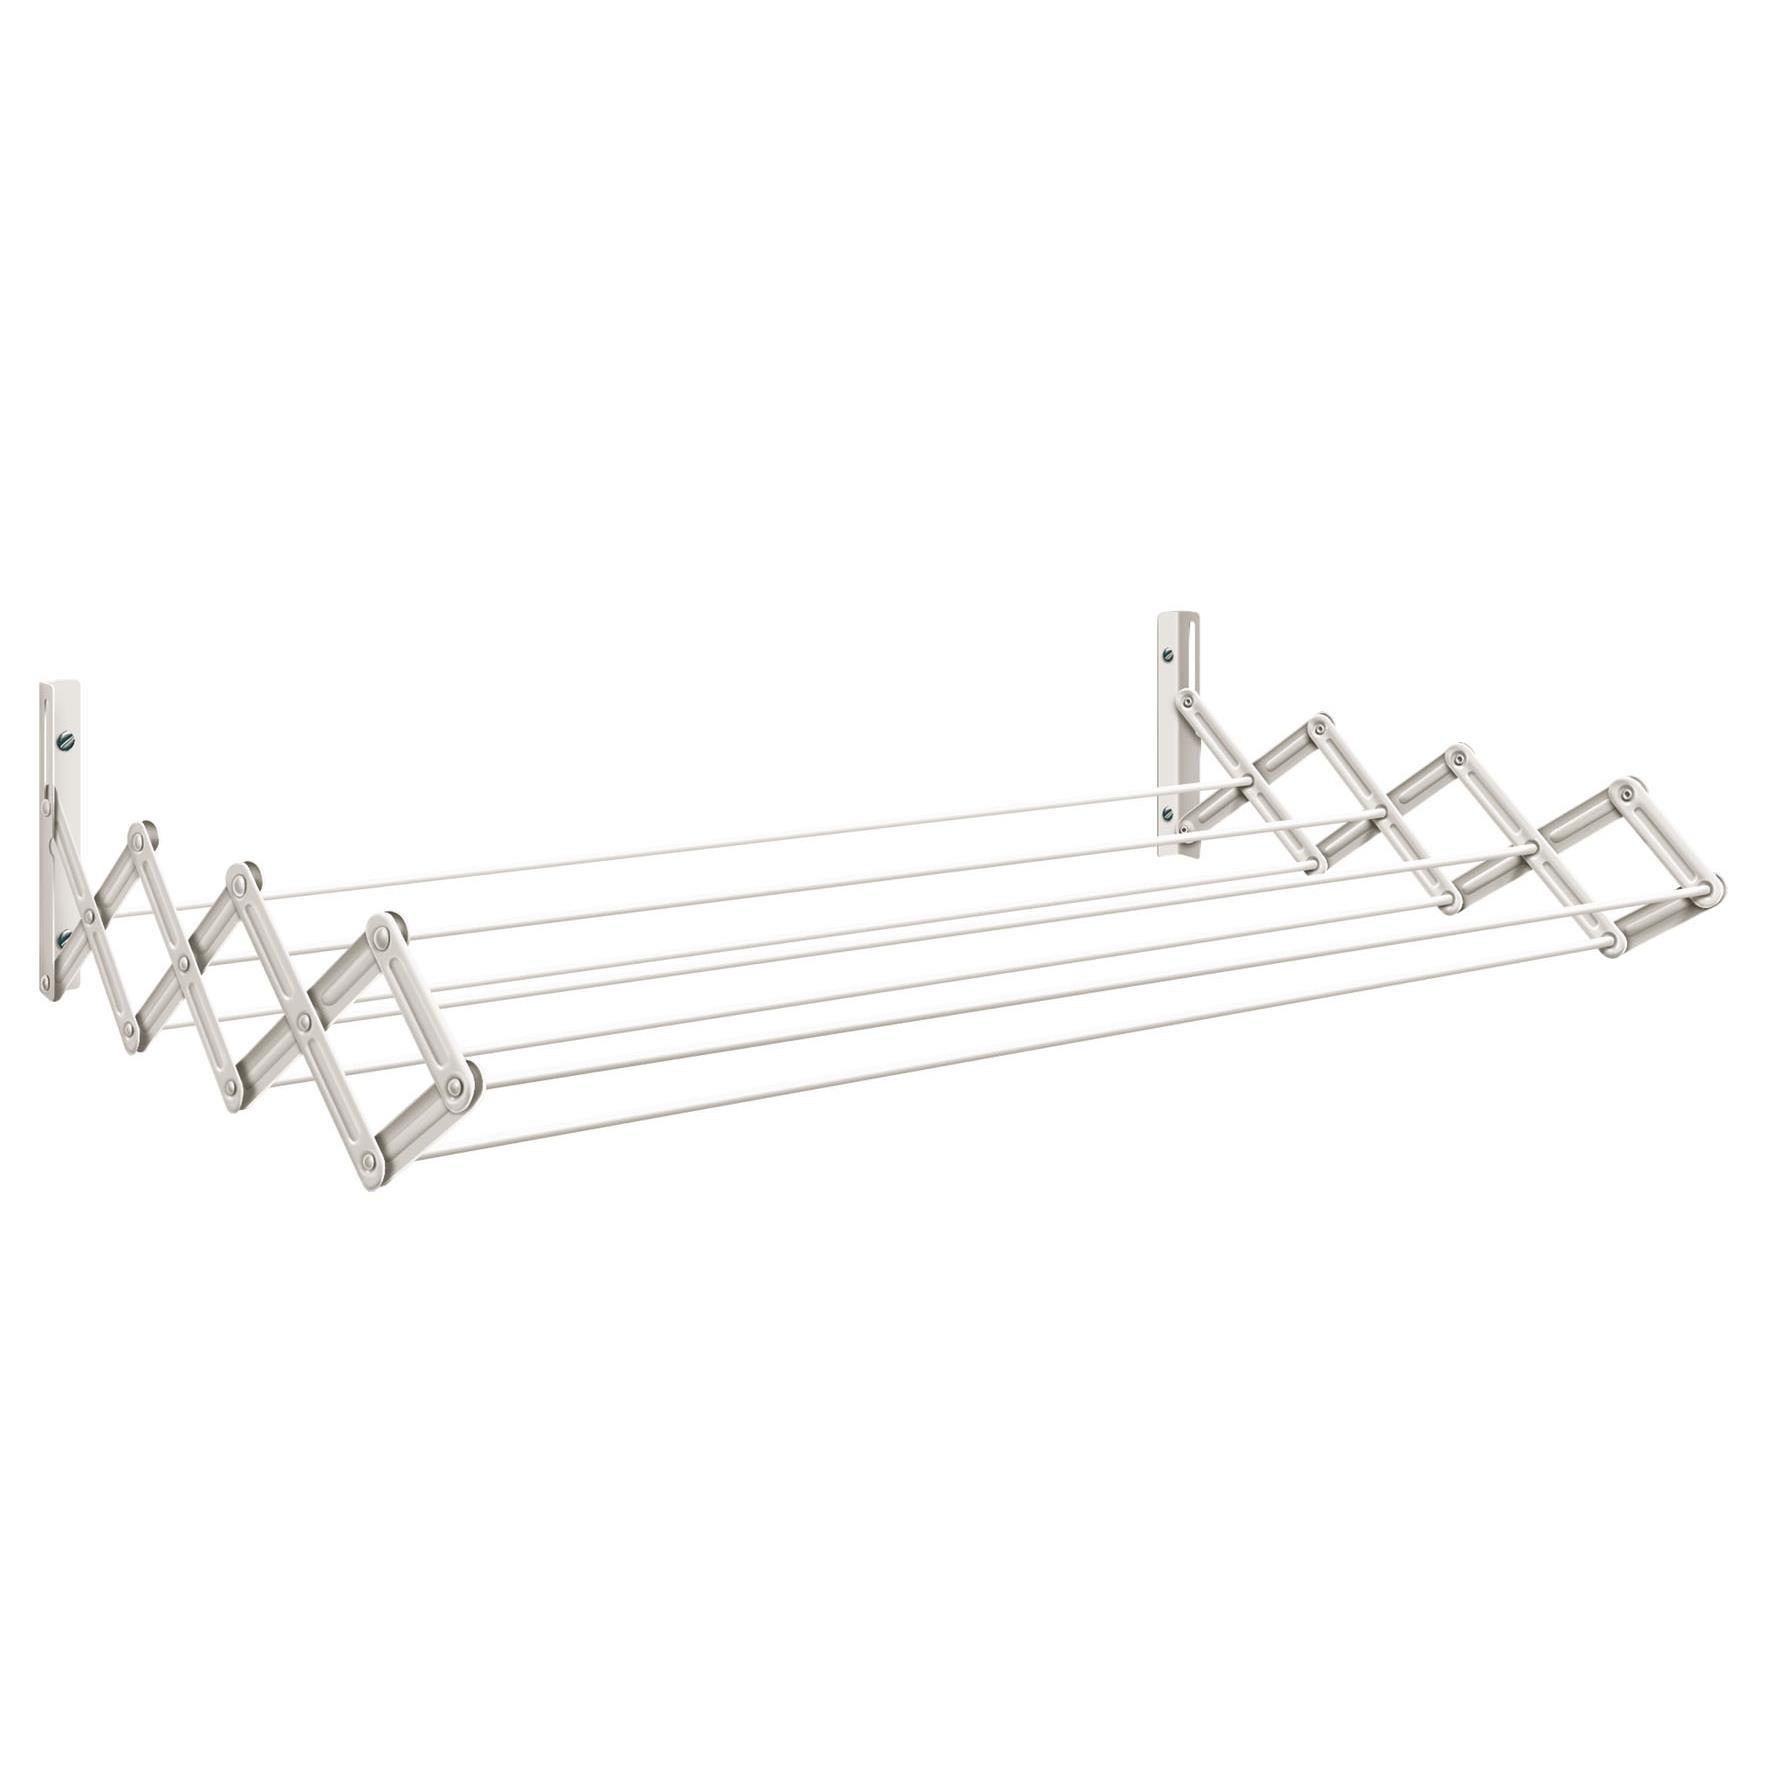 Varal de Parede Sanfonado de Aco 80x42cm Prata 21020 - Secalux